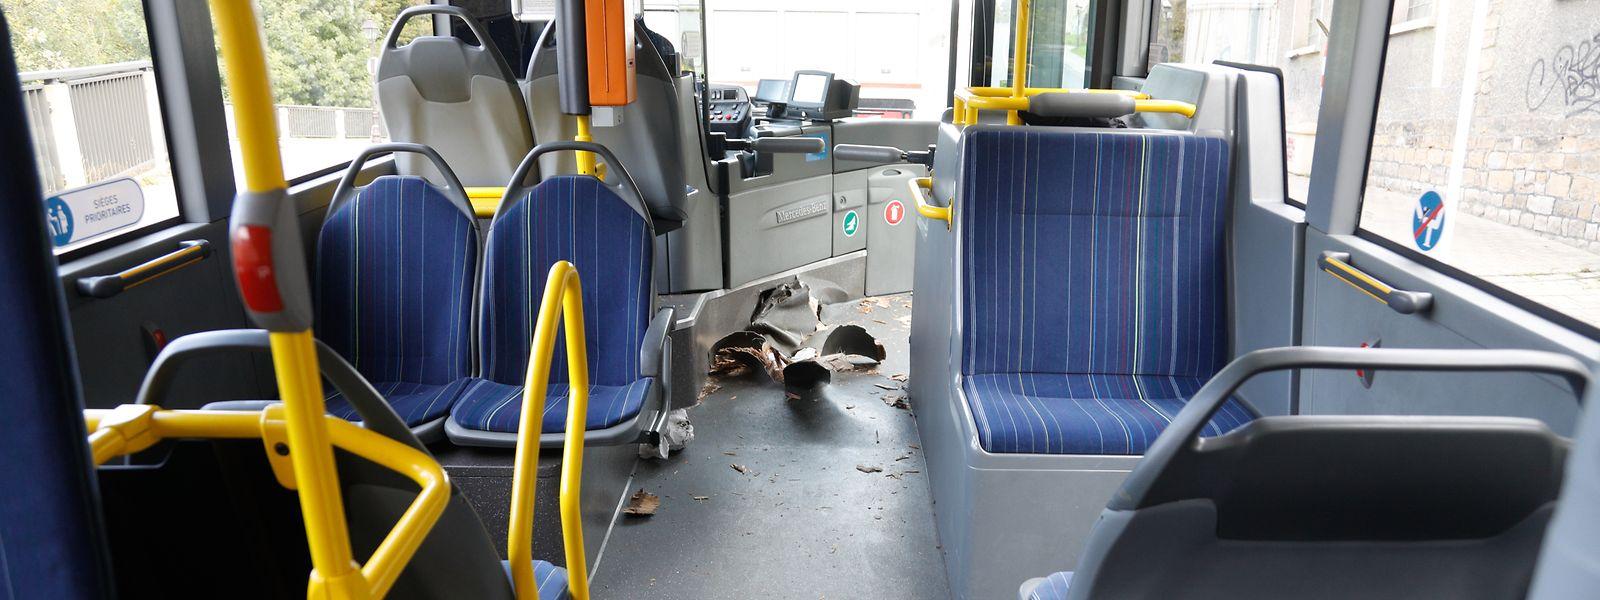 Der Poller durchdrang den Boden des Linienbusses.